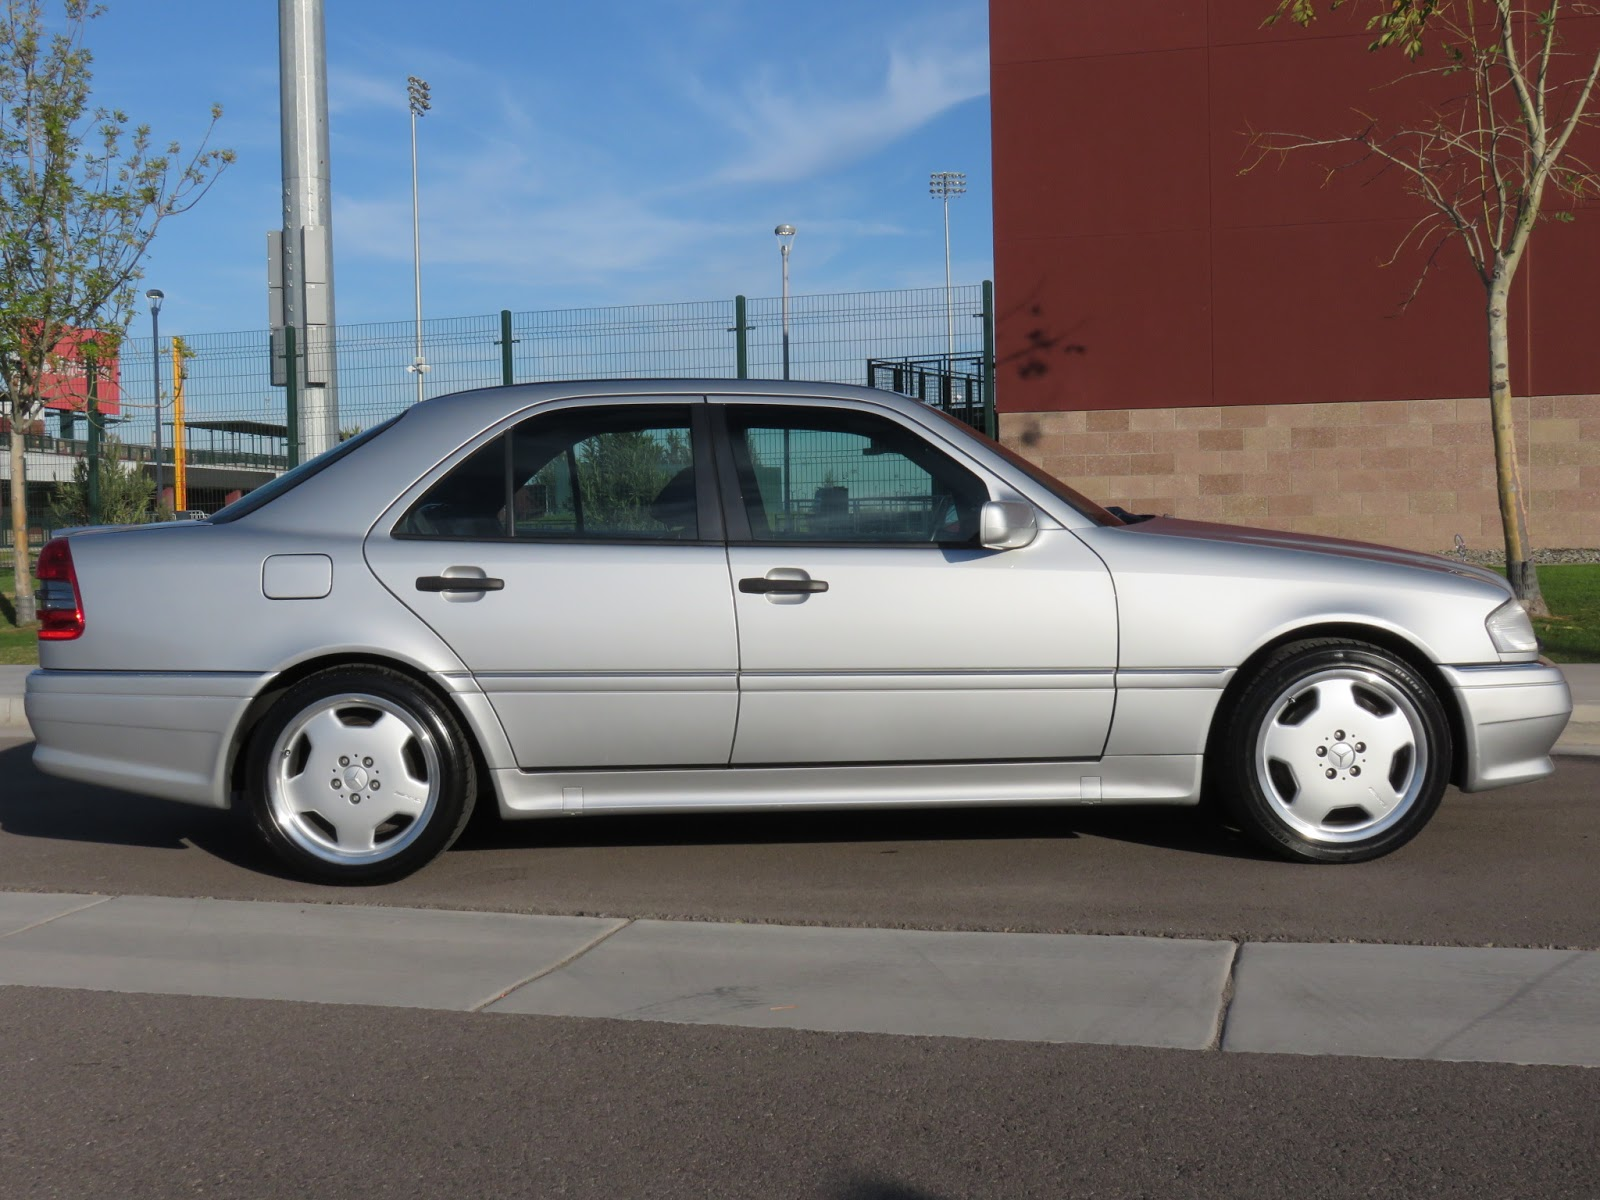 1996 mercedes benz w202 c36 amg benztuning for Mercedes benz 1996